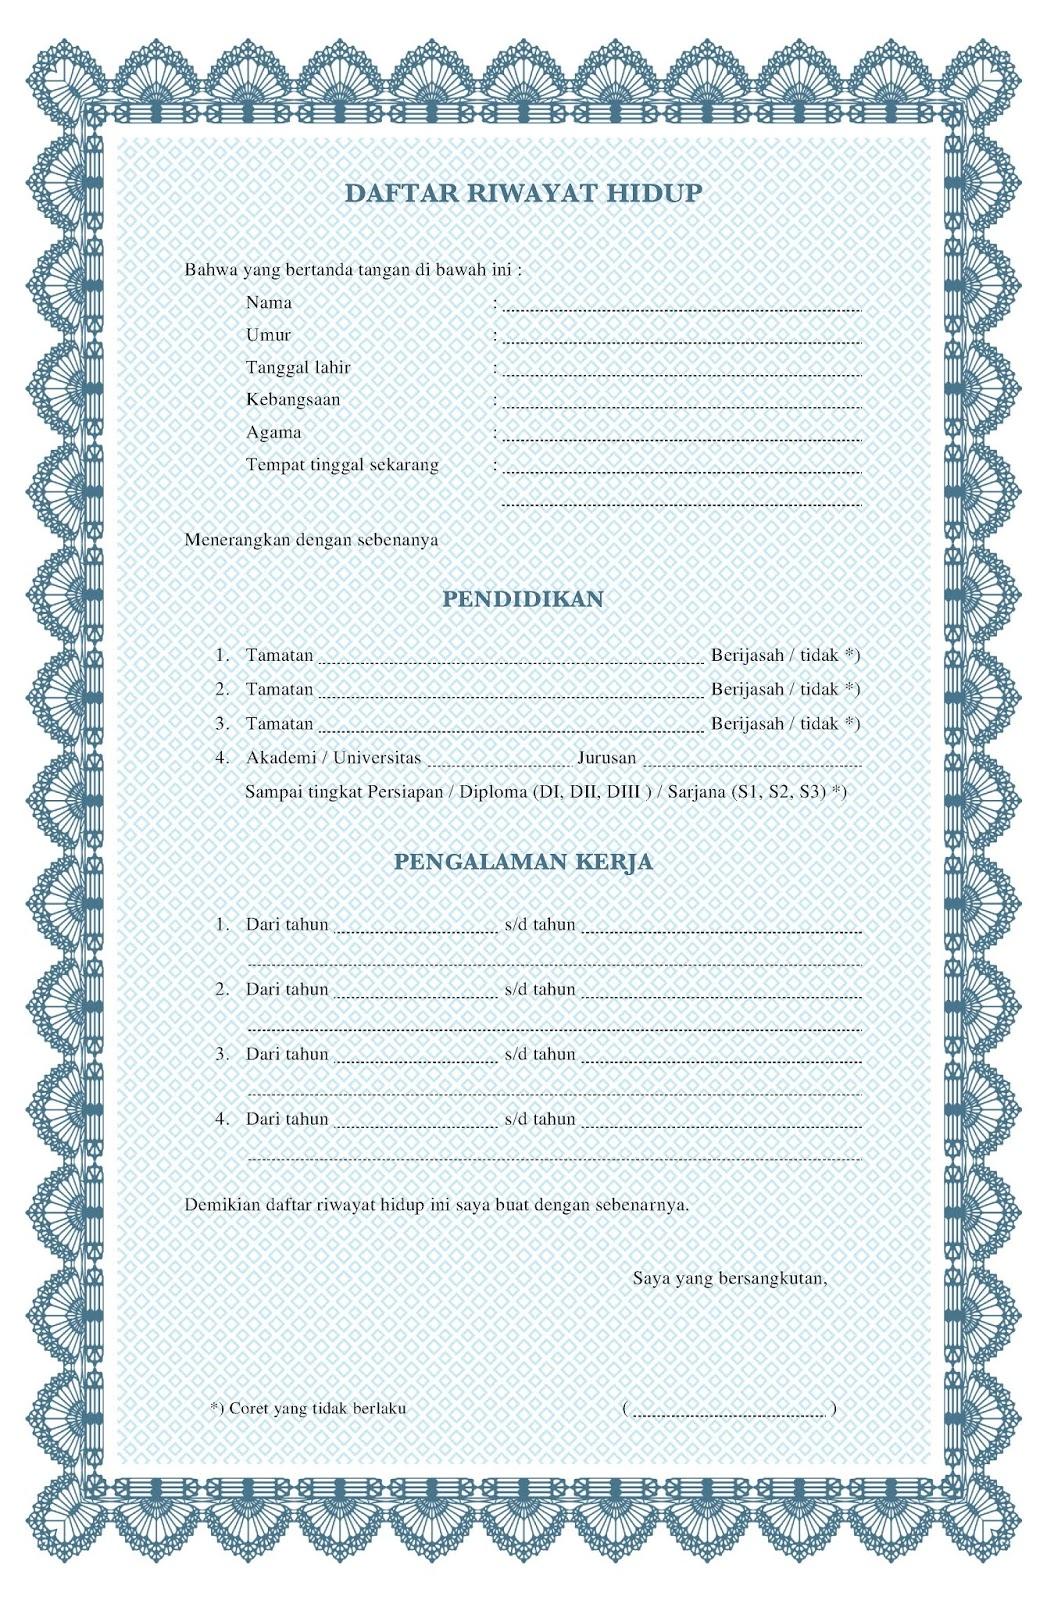 Daftar riwayat hidup cv kosong doc pdf word tulis tangan